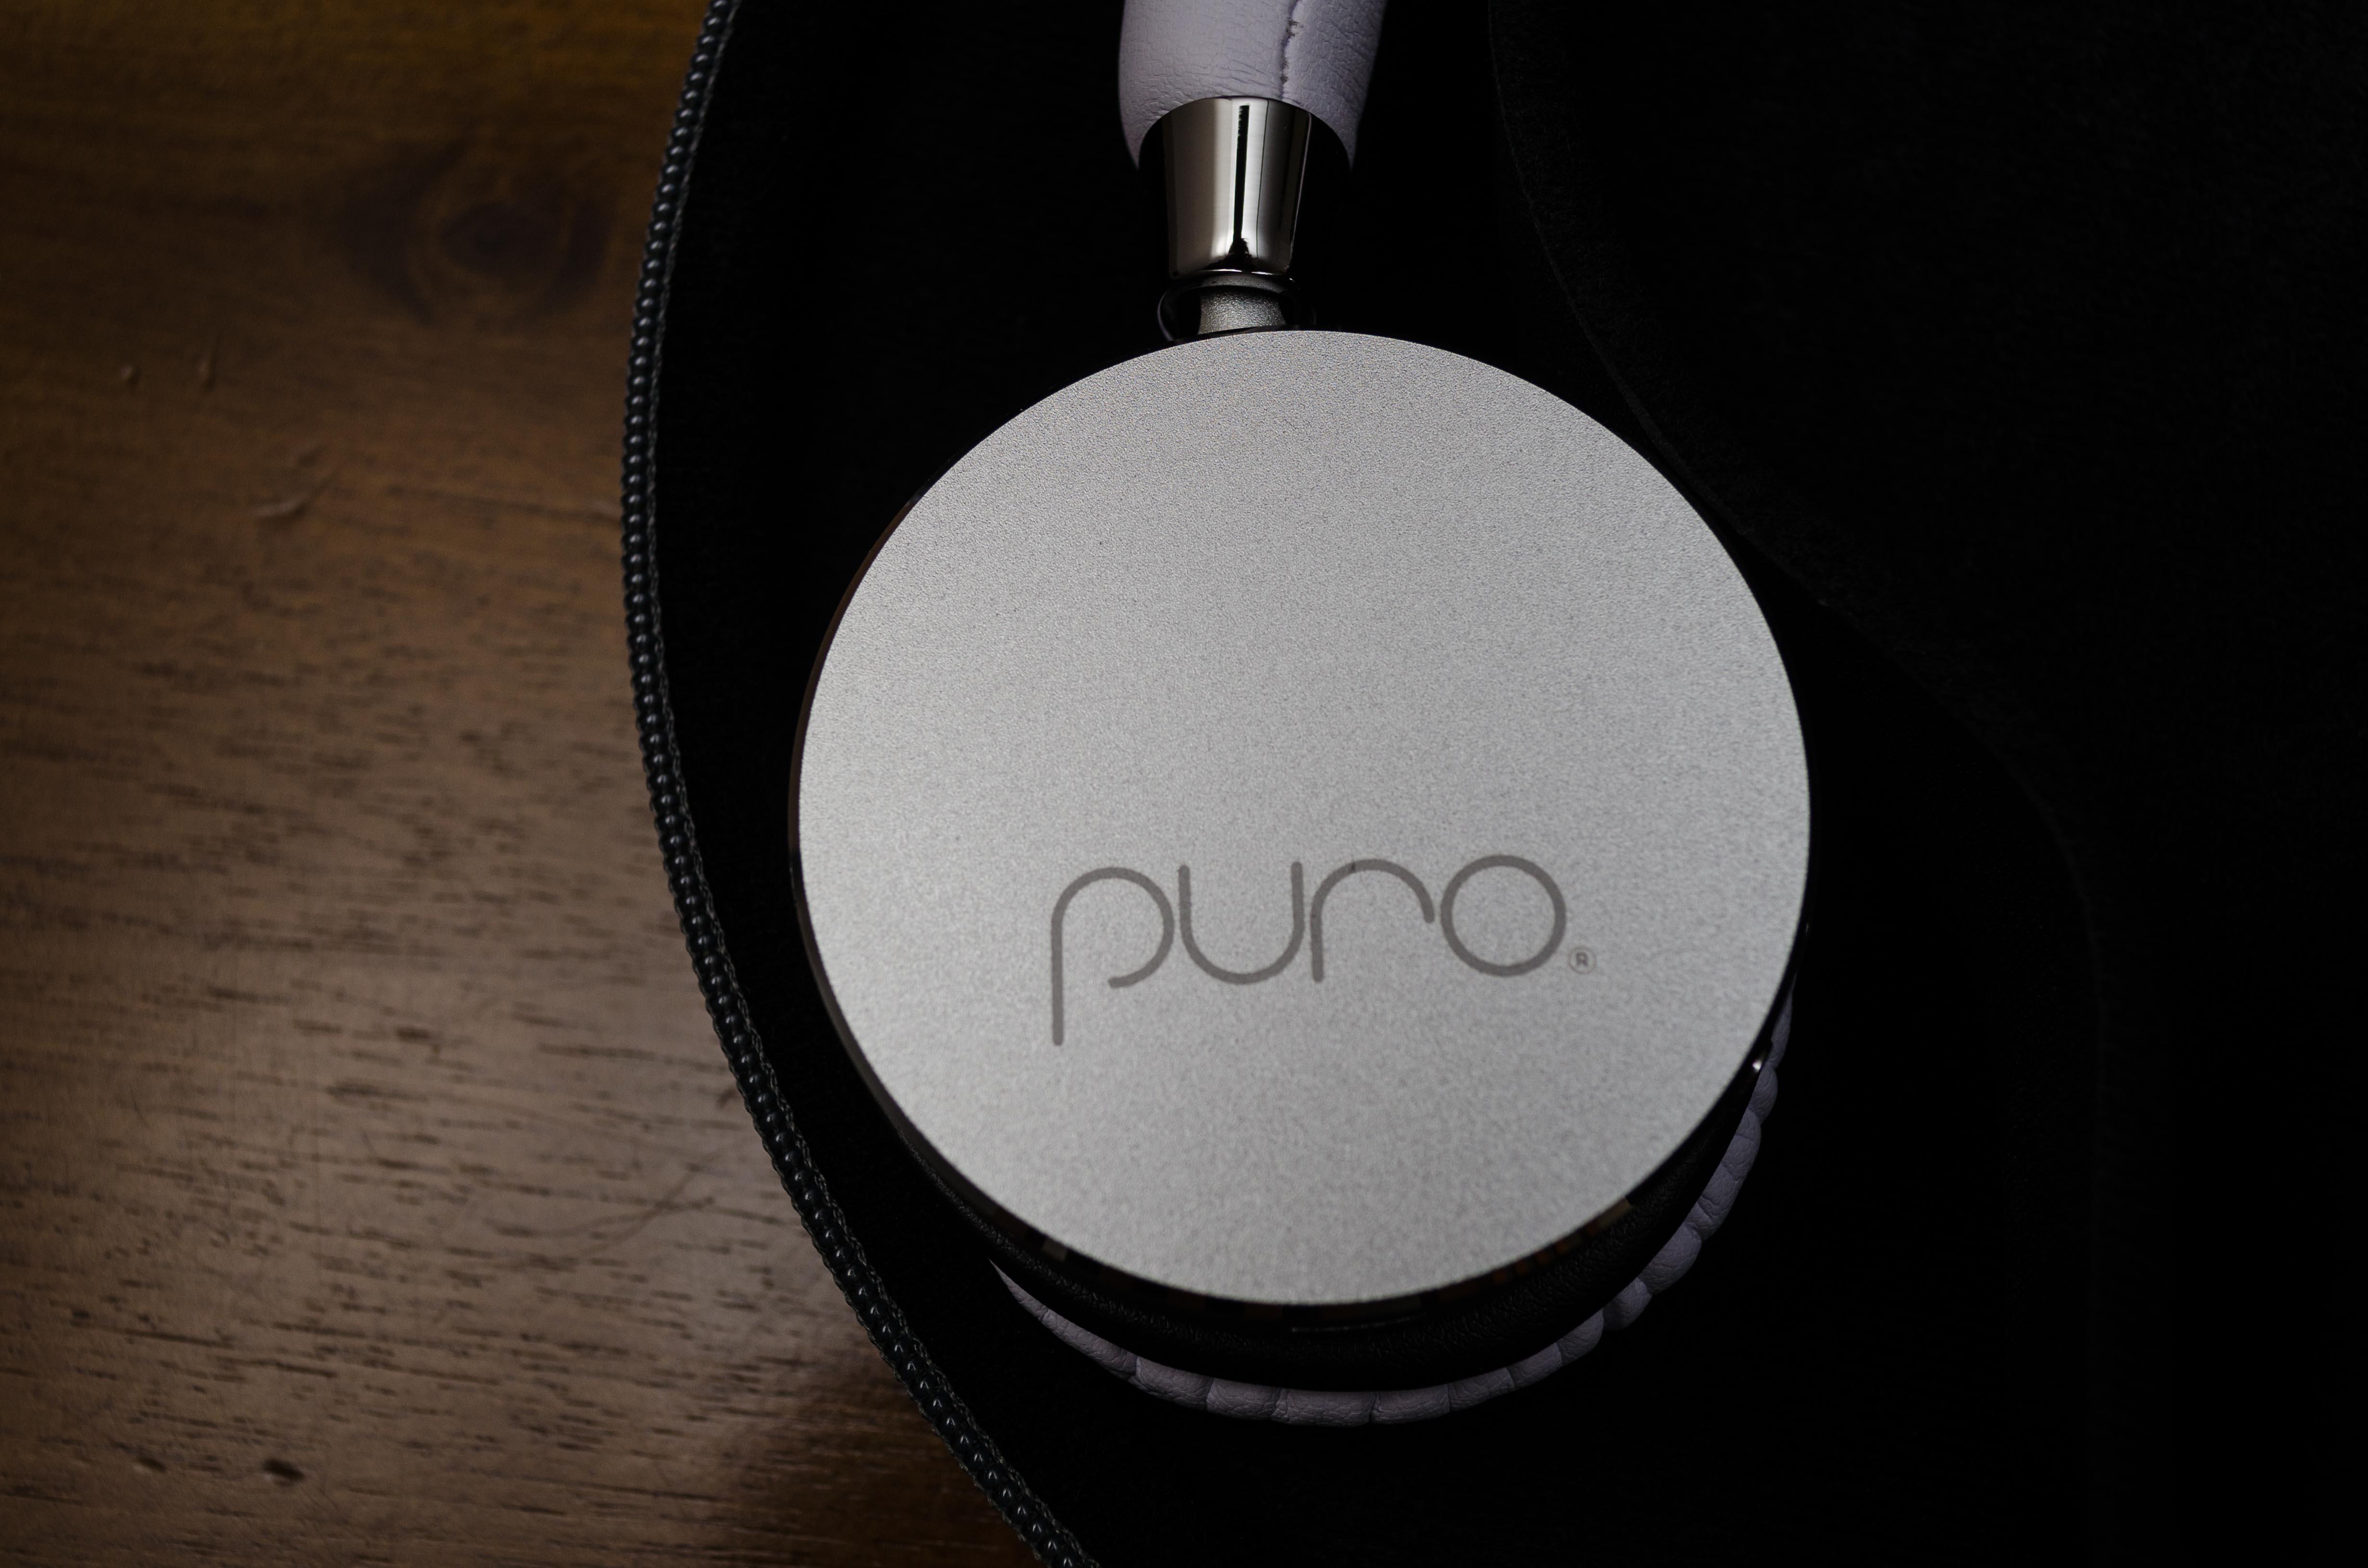 Puro Sound Labs BT2200 headphones